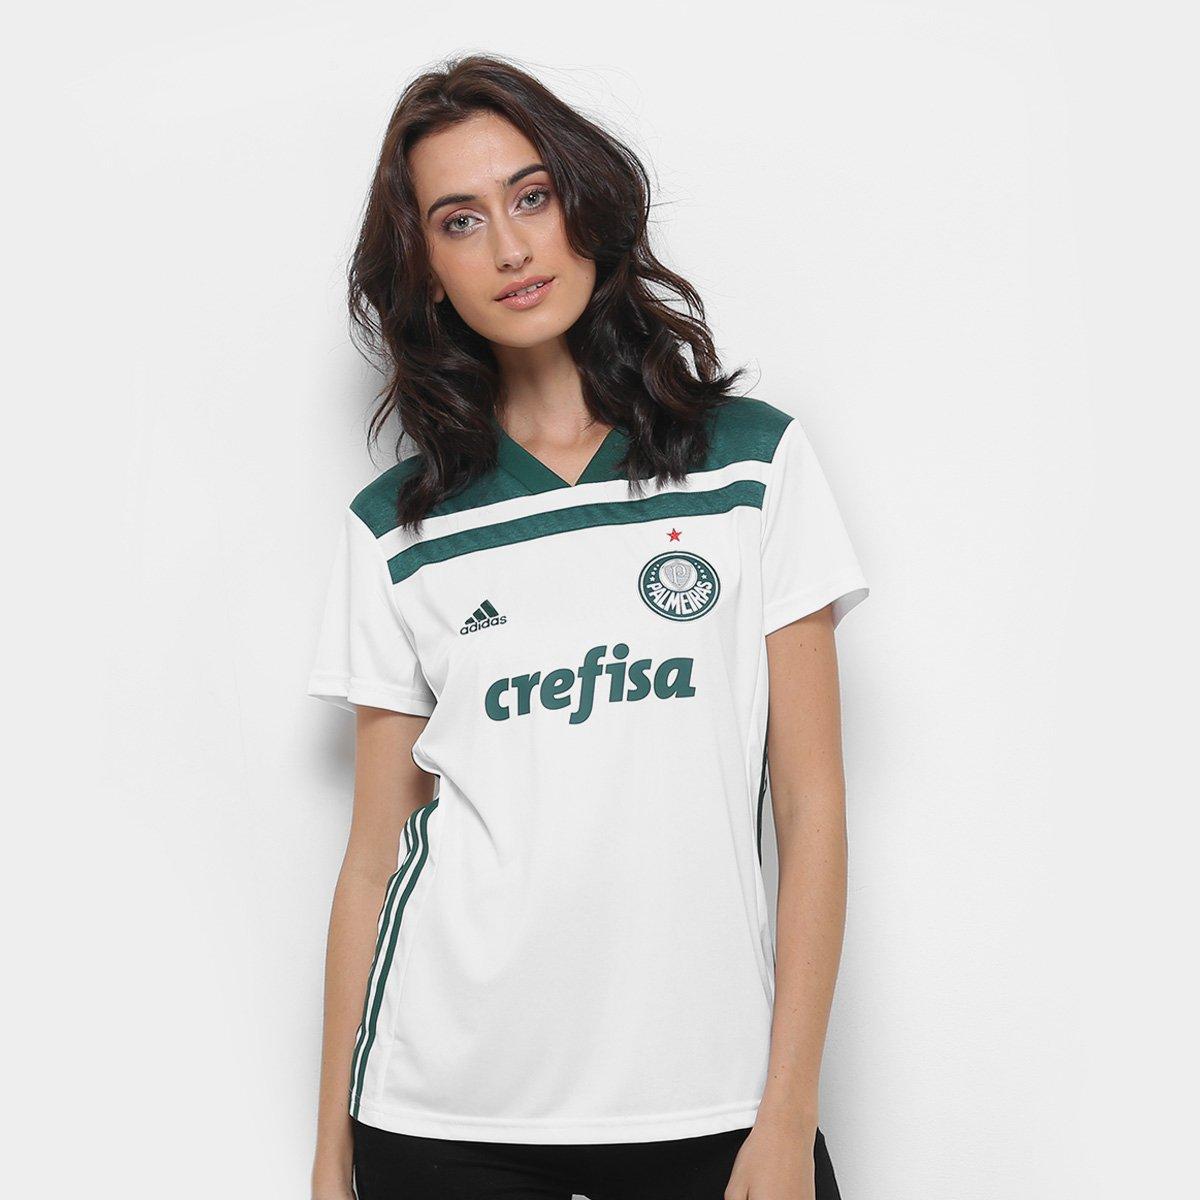 3b0a6ed04b Camisa Palmeiras II 2018 s n° Torcedor Adidas Feminina - Compre ...